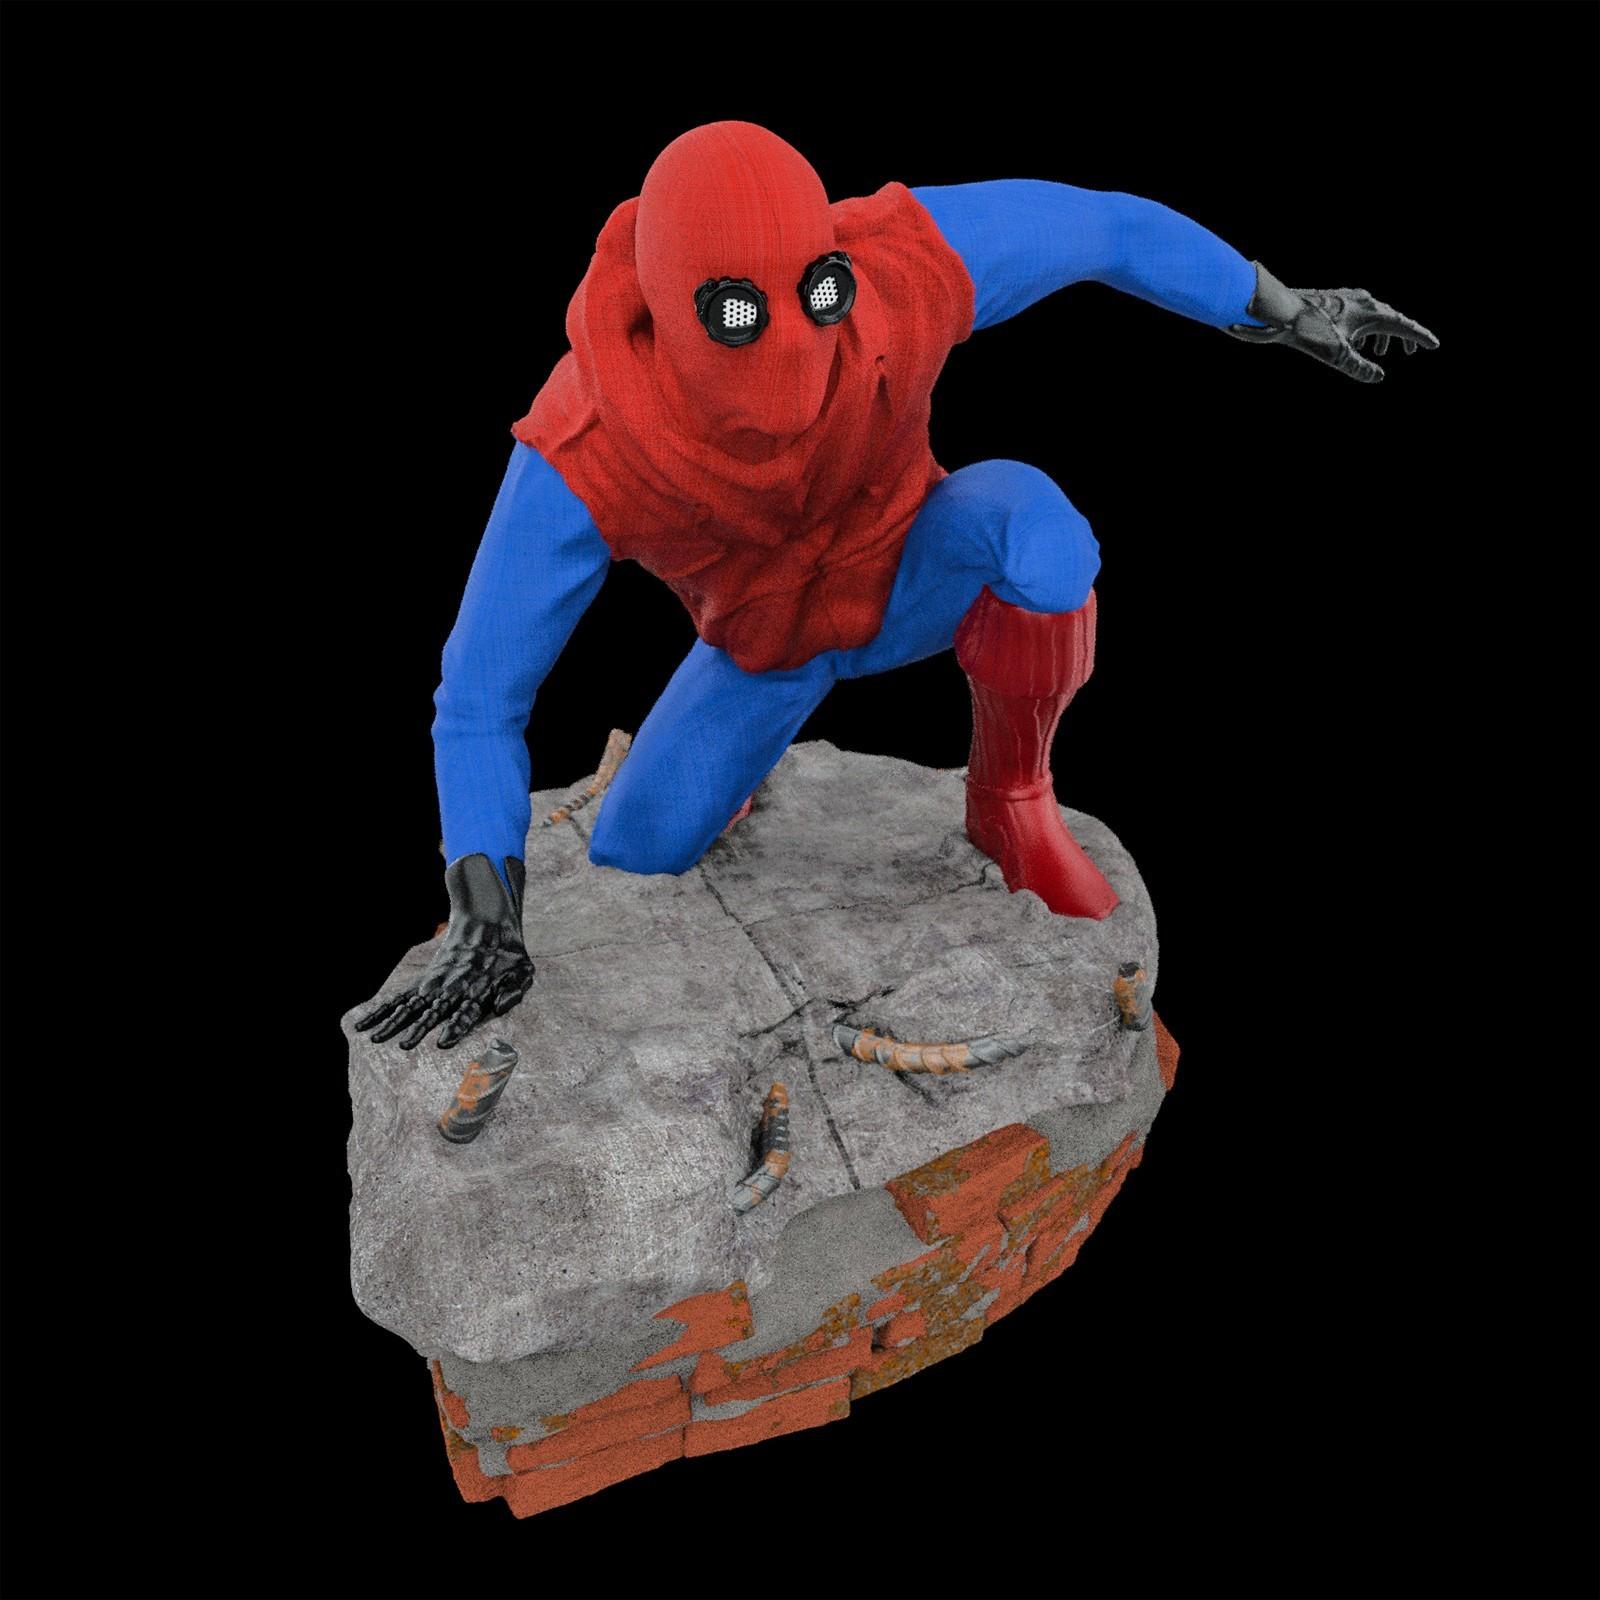 15.jpg Download STL file Spider-Man Homemade Suit • Design to 3D print, tolgaaxu